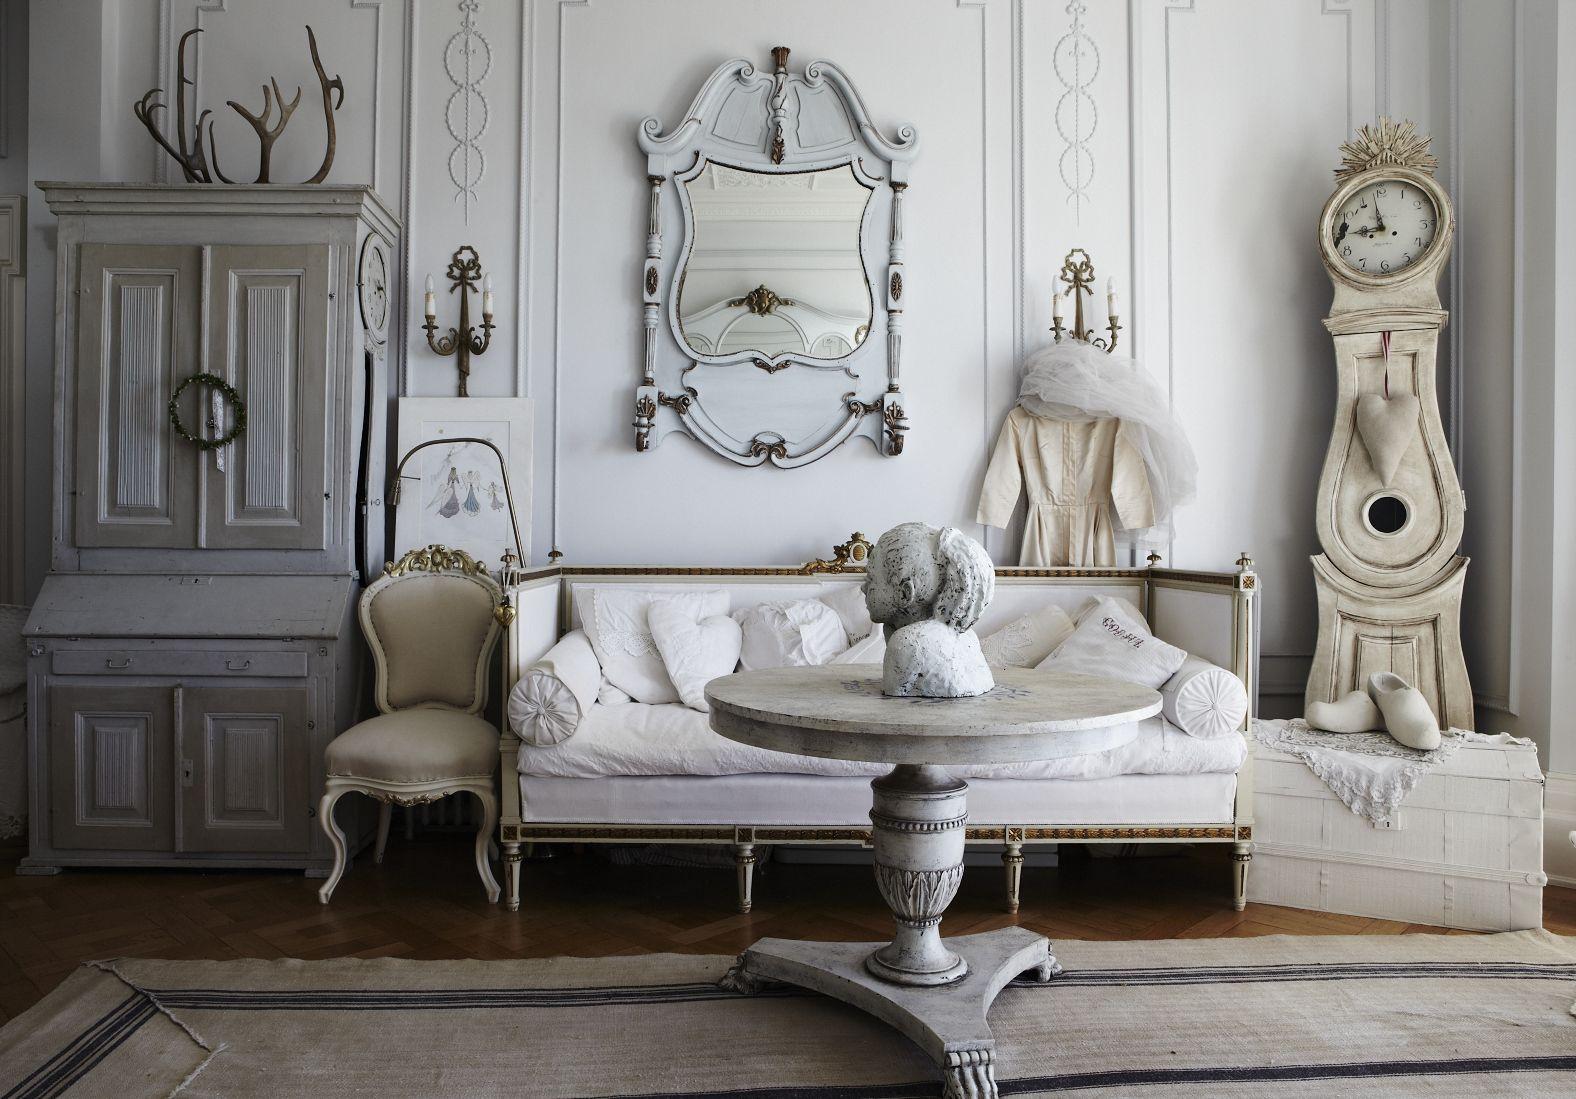 De 50 fotos de salas decoradas modernas peque as for 25m2 wohnzimmer einrichten